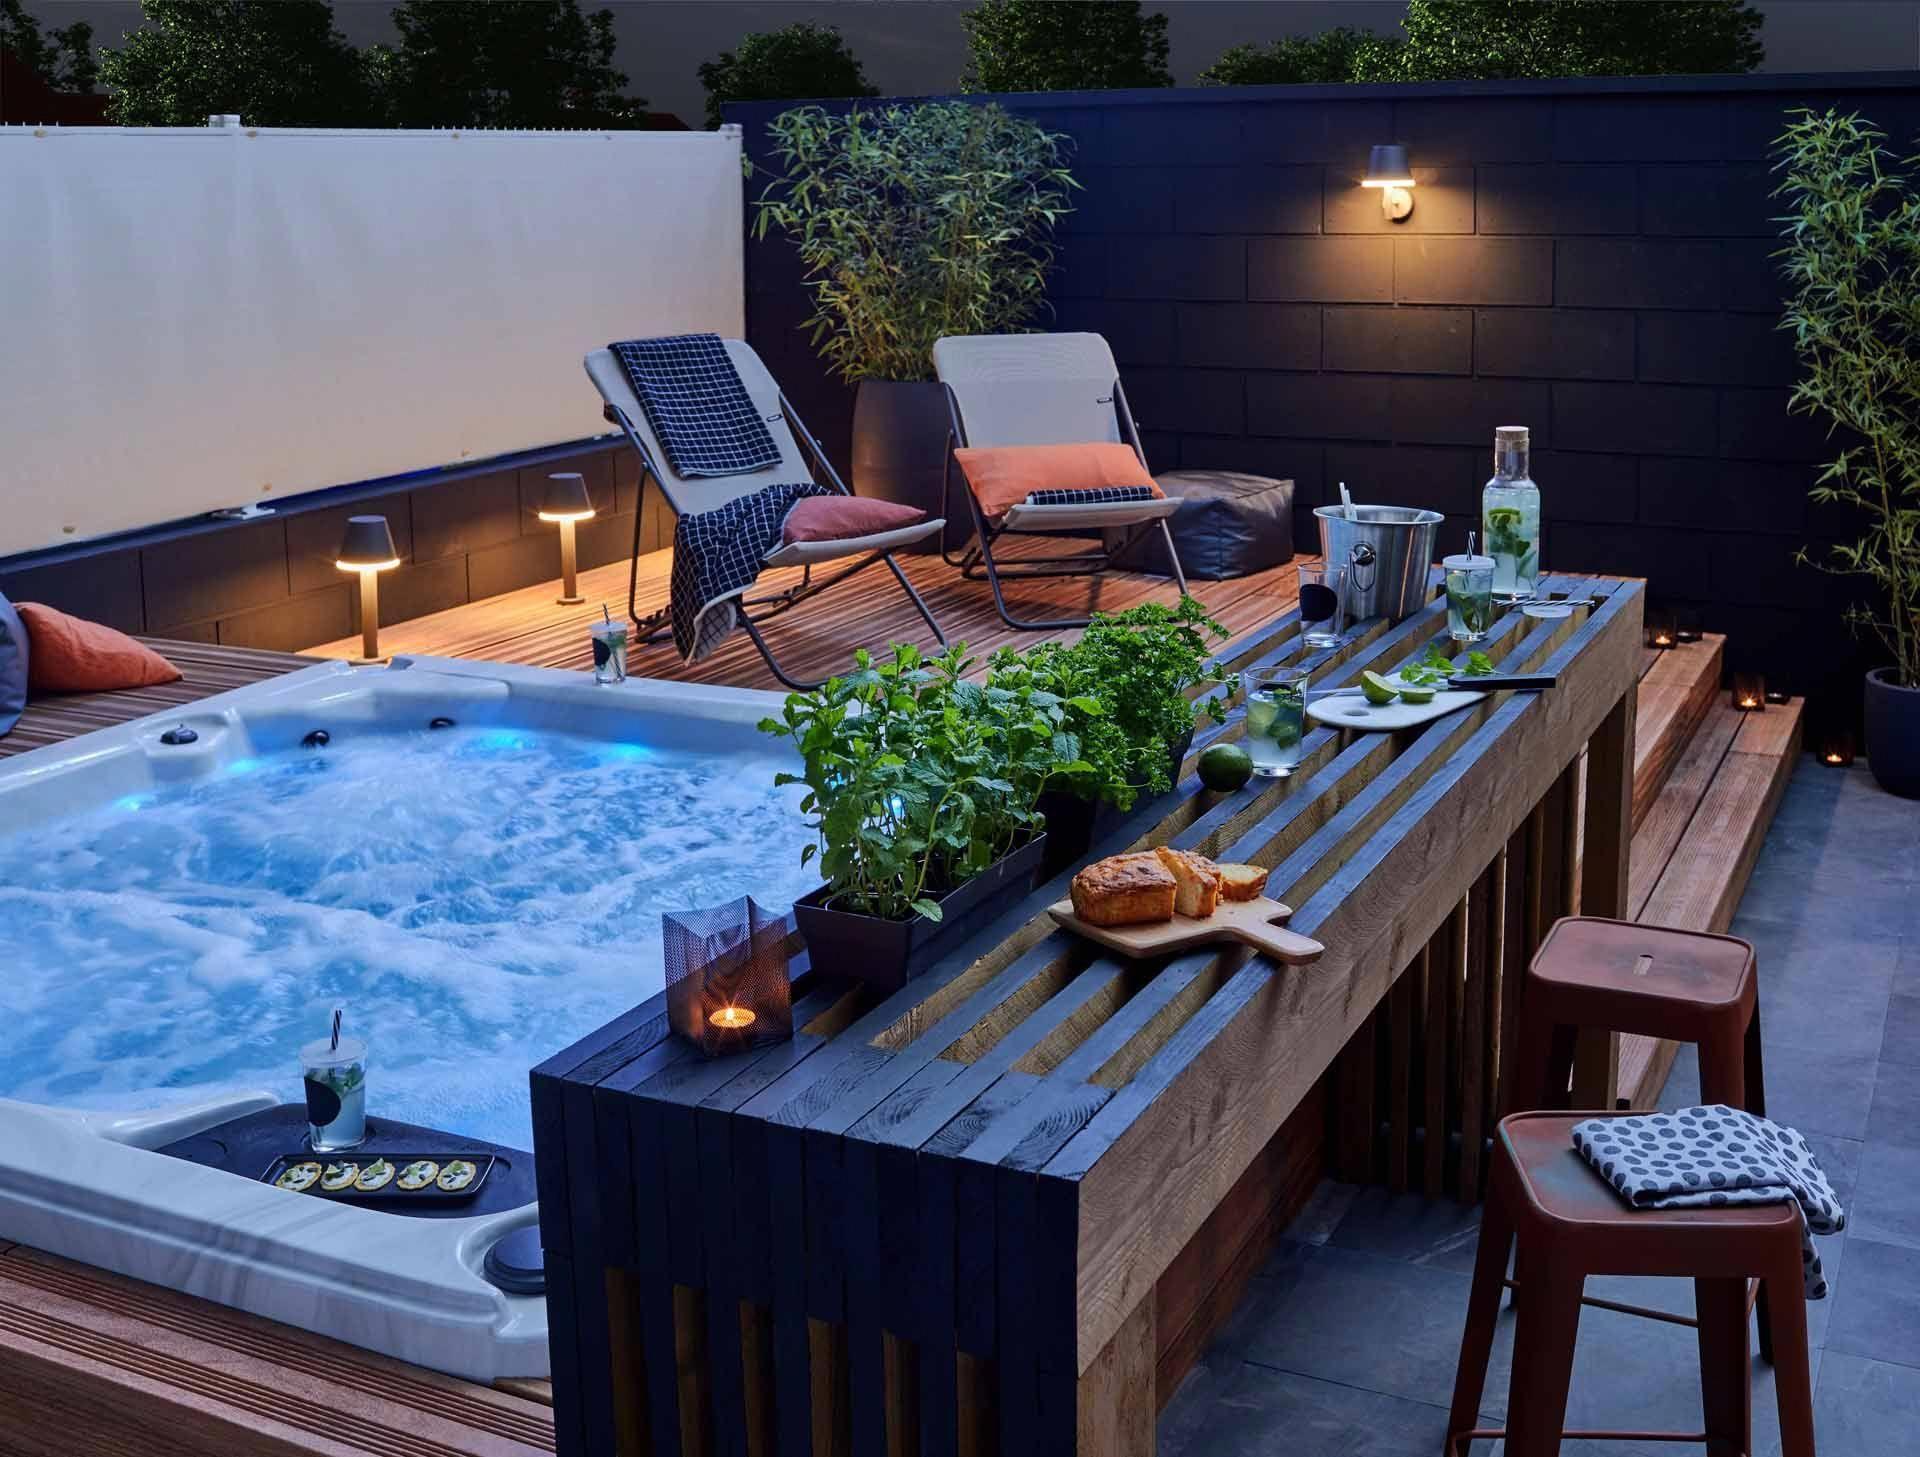 Autre Alternative Installer Un Bar Permanent Qui Resistera Aux Intemperies C Leroy Merlin Gazeboideas Hot Tub Backyard Hot Tub Patio Hot Tub Outdoor